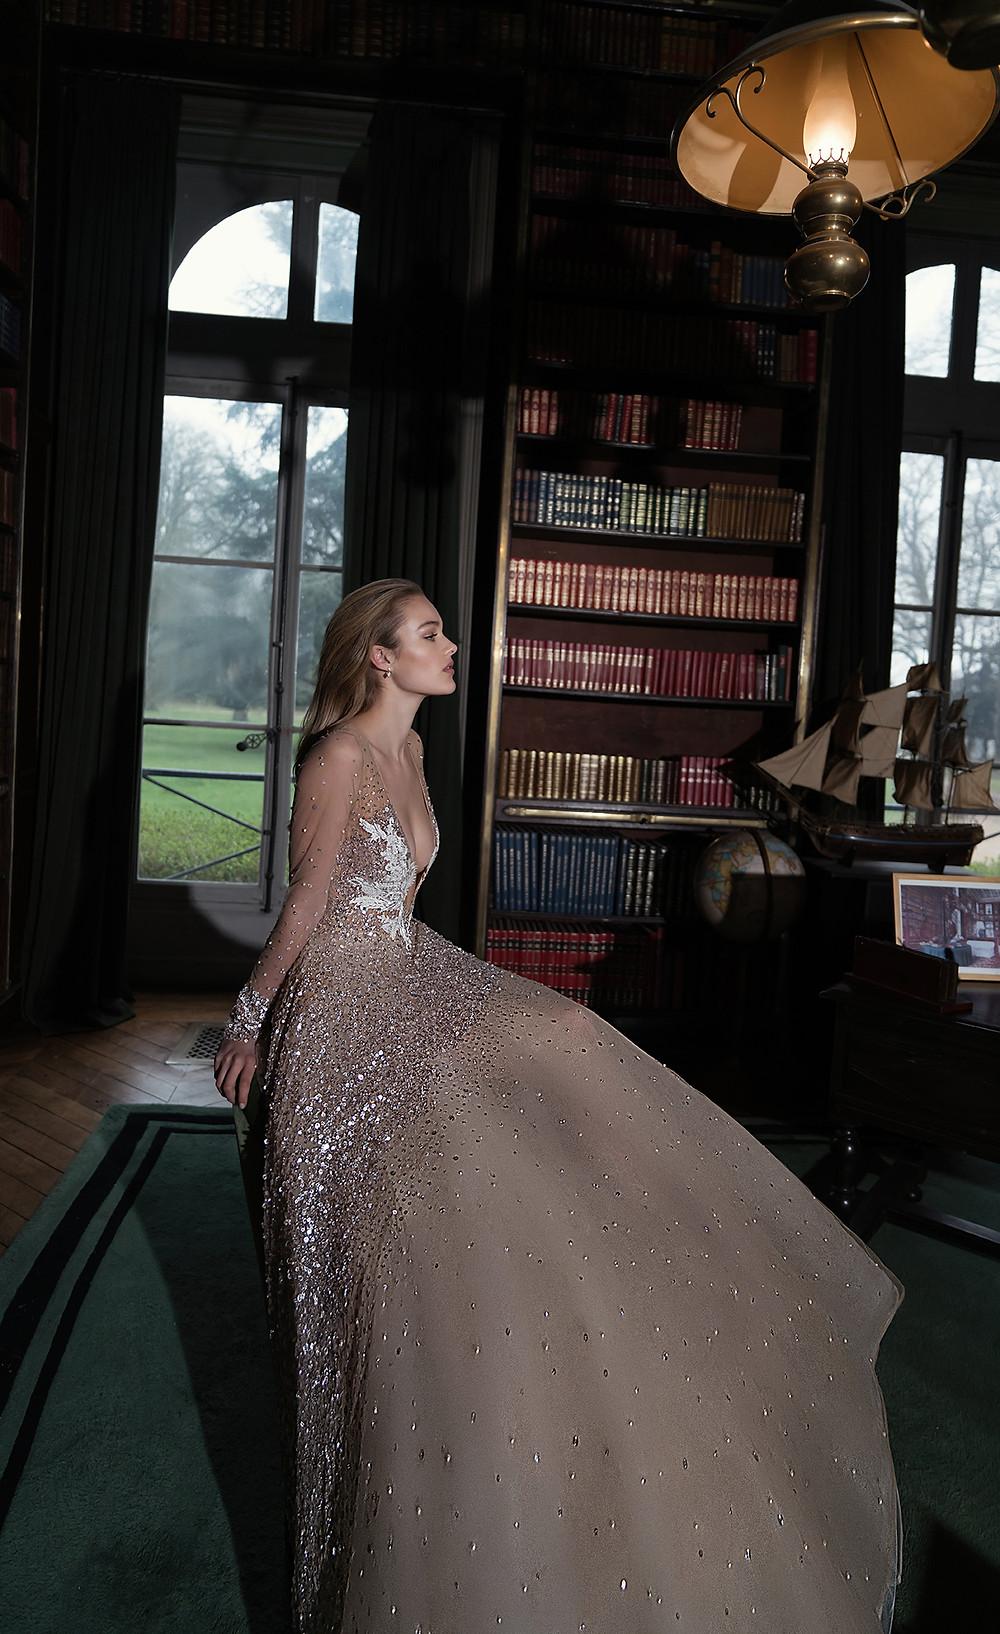 An Inbal Dror sparkly blush and gold ball gown wedding dress